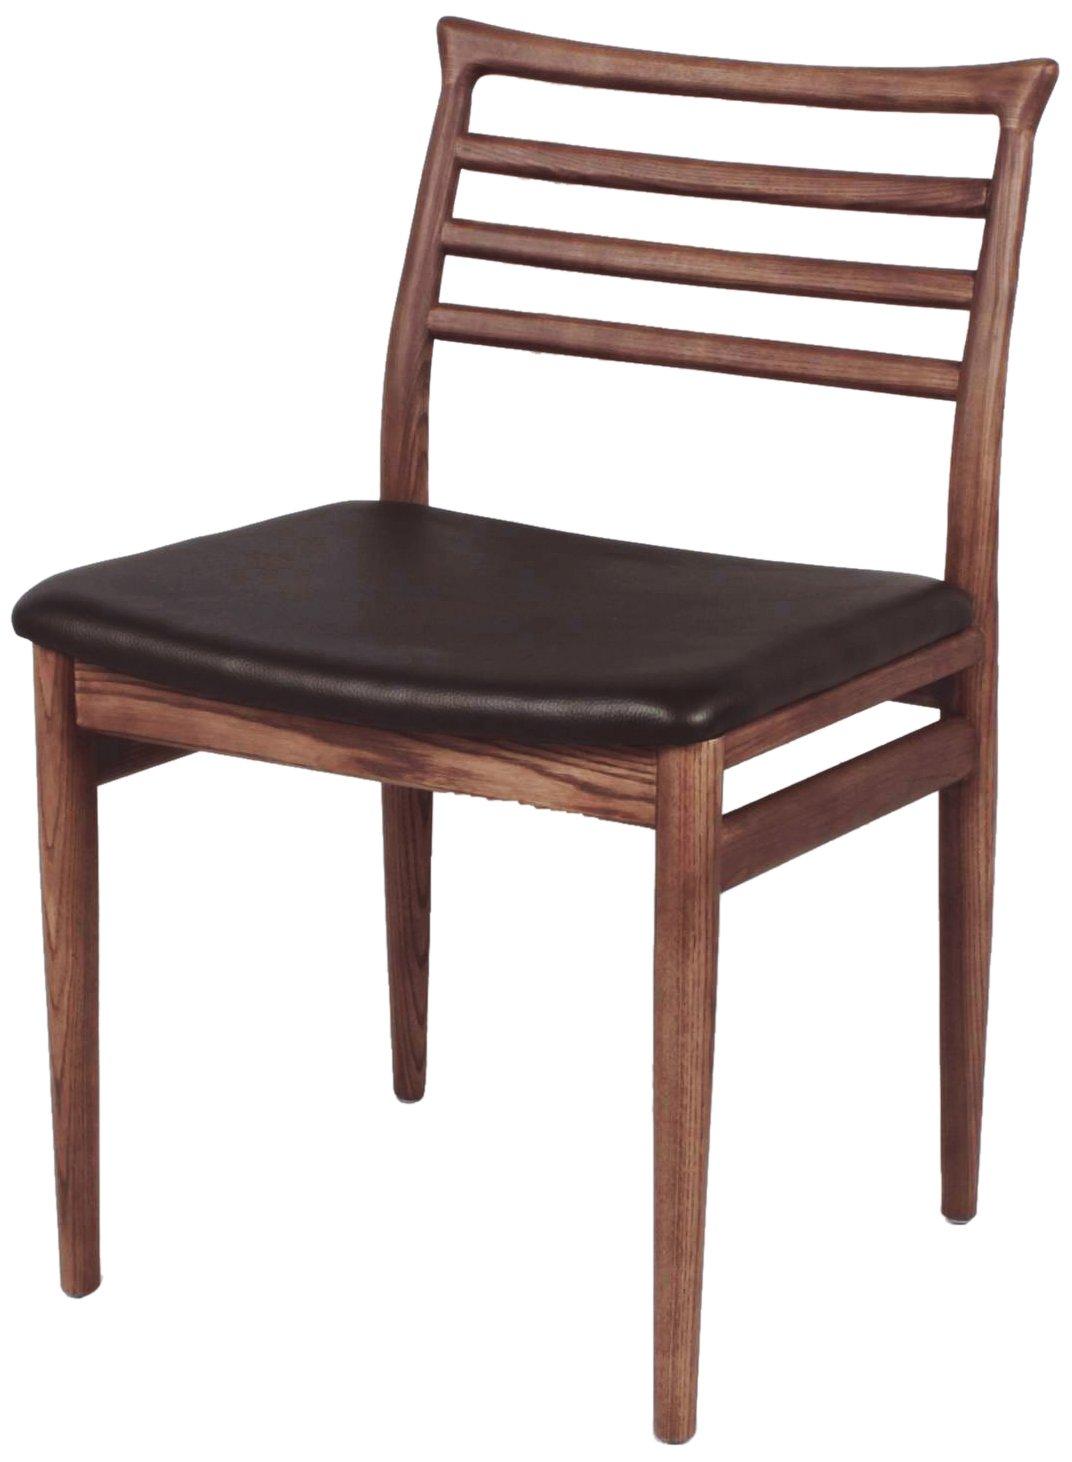 Control Brand Childrens Mid Century Side Chair in Wood Eiffel Base